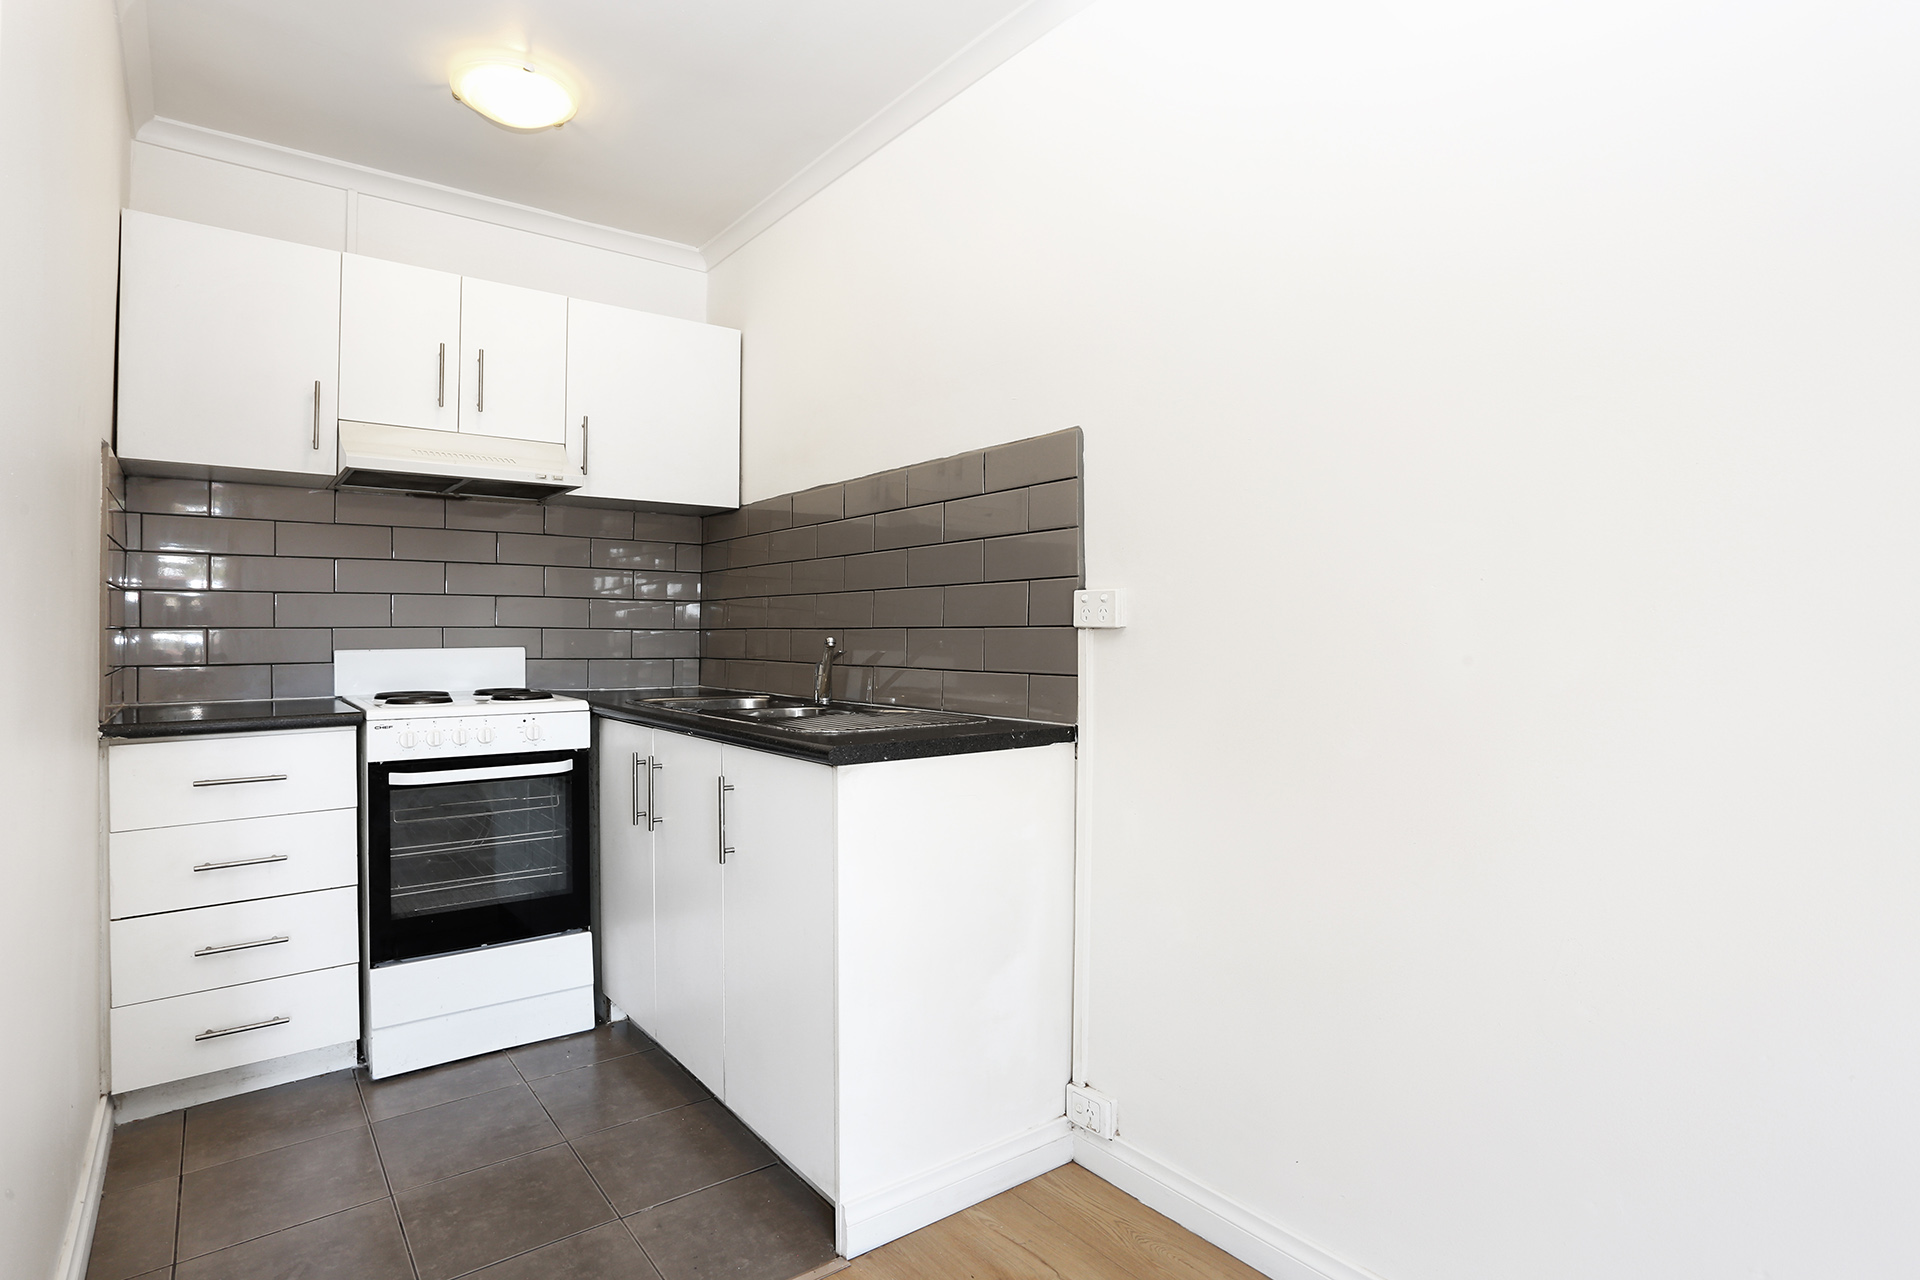 LowRes 3728 11 1 Hatfield Court West Footscray2245429 122EOS5D 265